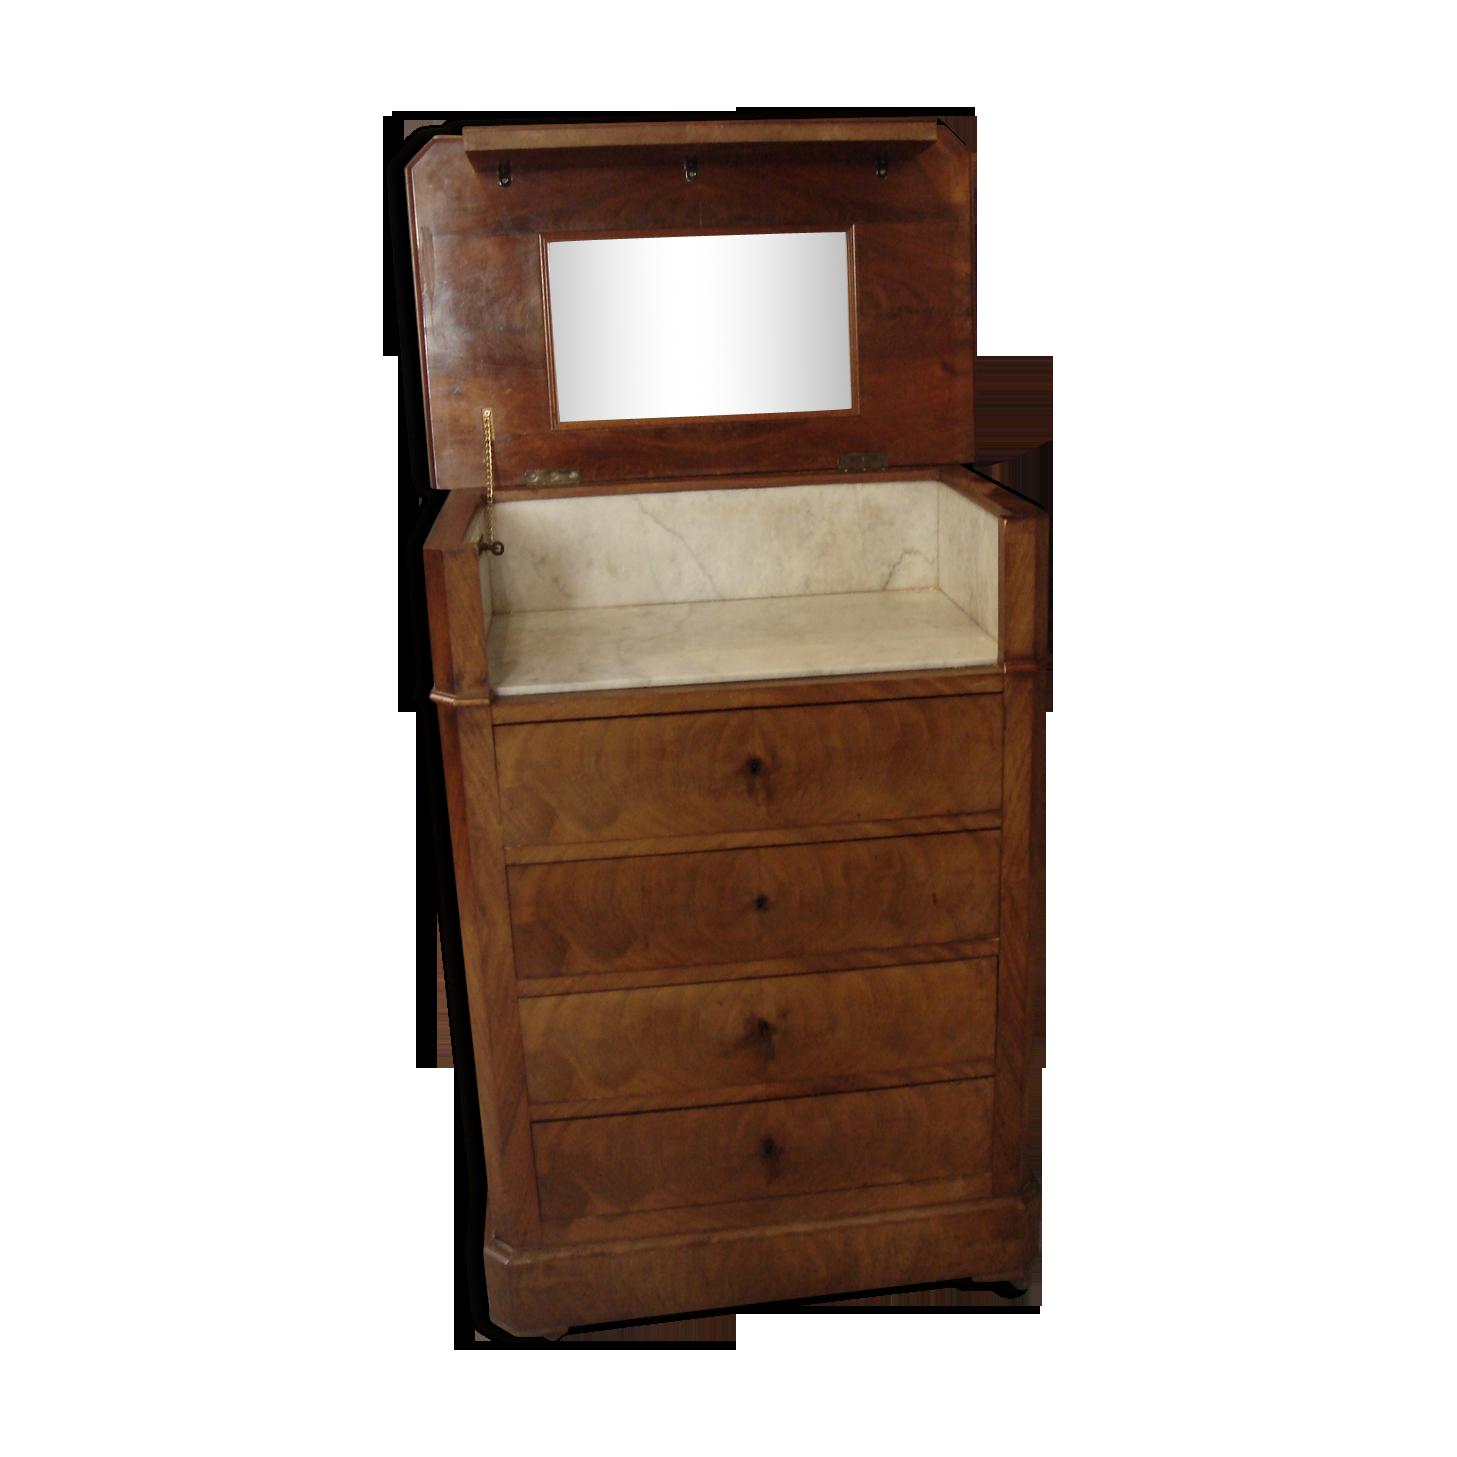 Art deco toilet chest on wheels wood wooden art deco